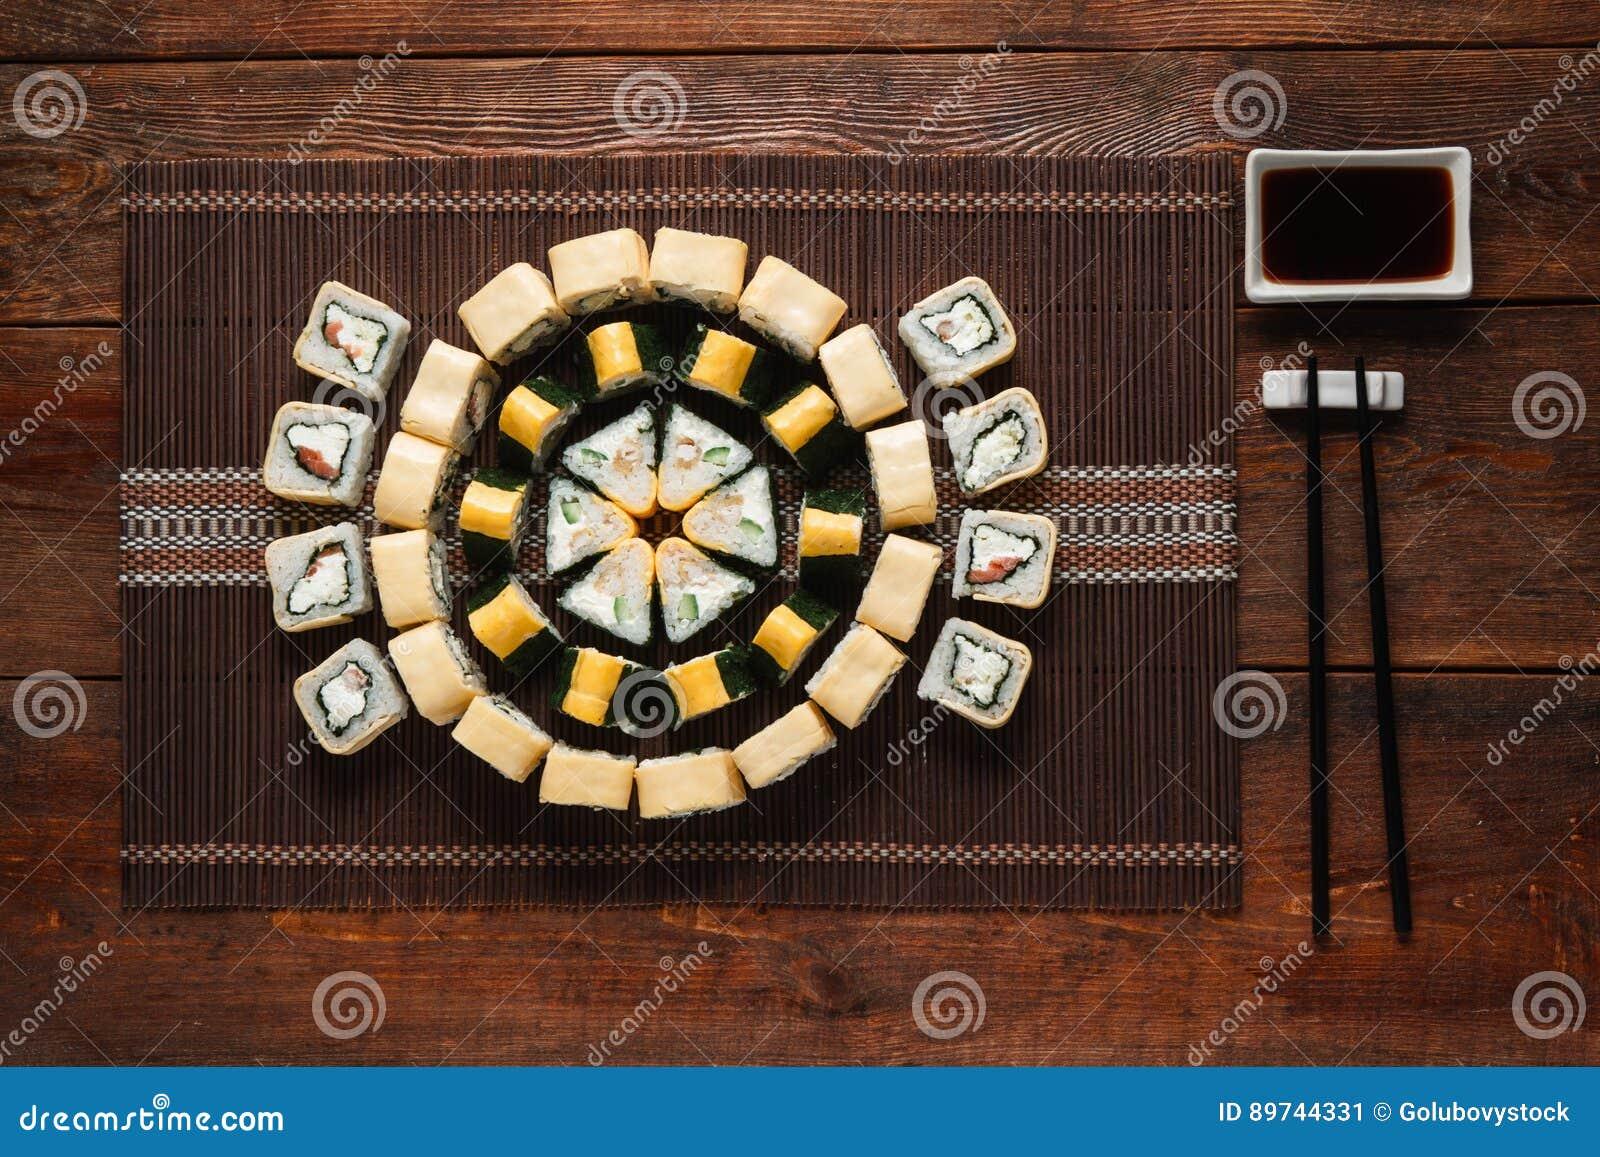 Japanese Cuisine Delicious Sushi Set Flat Lay Stock Image Image Of Traditional Rice 89744331